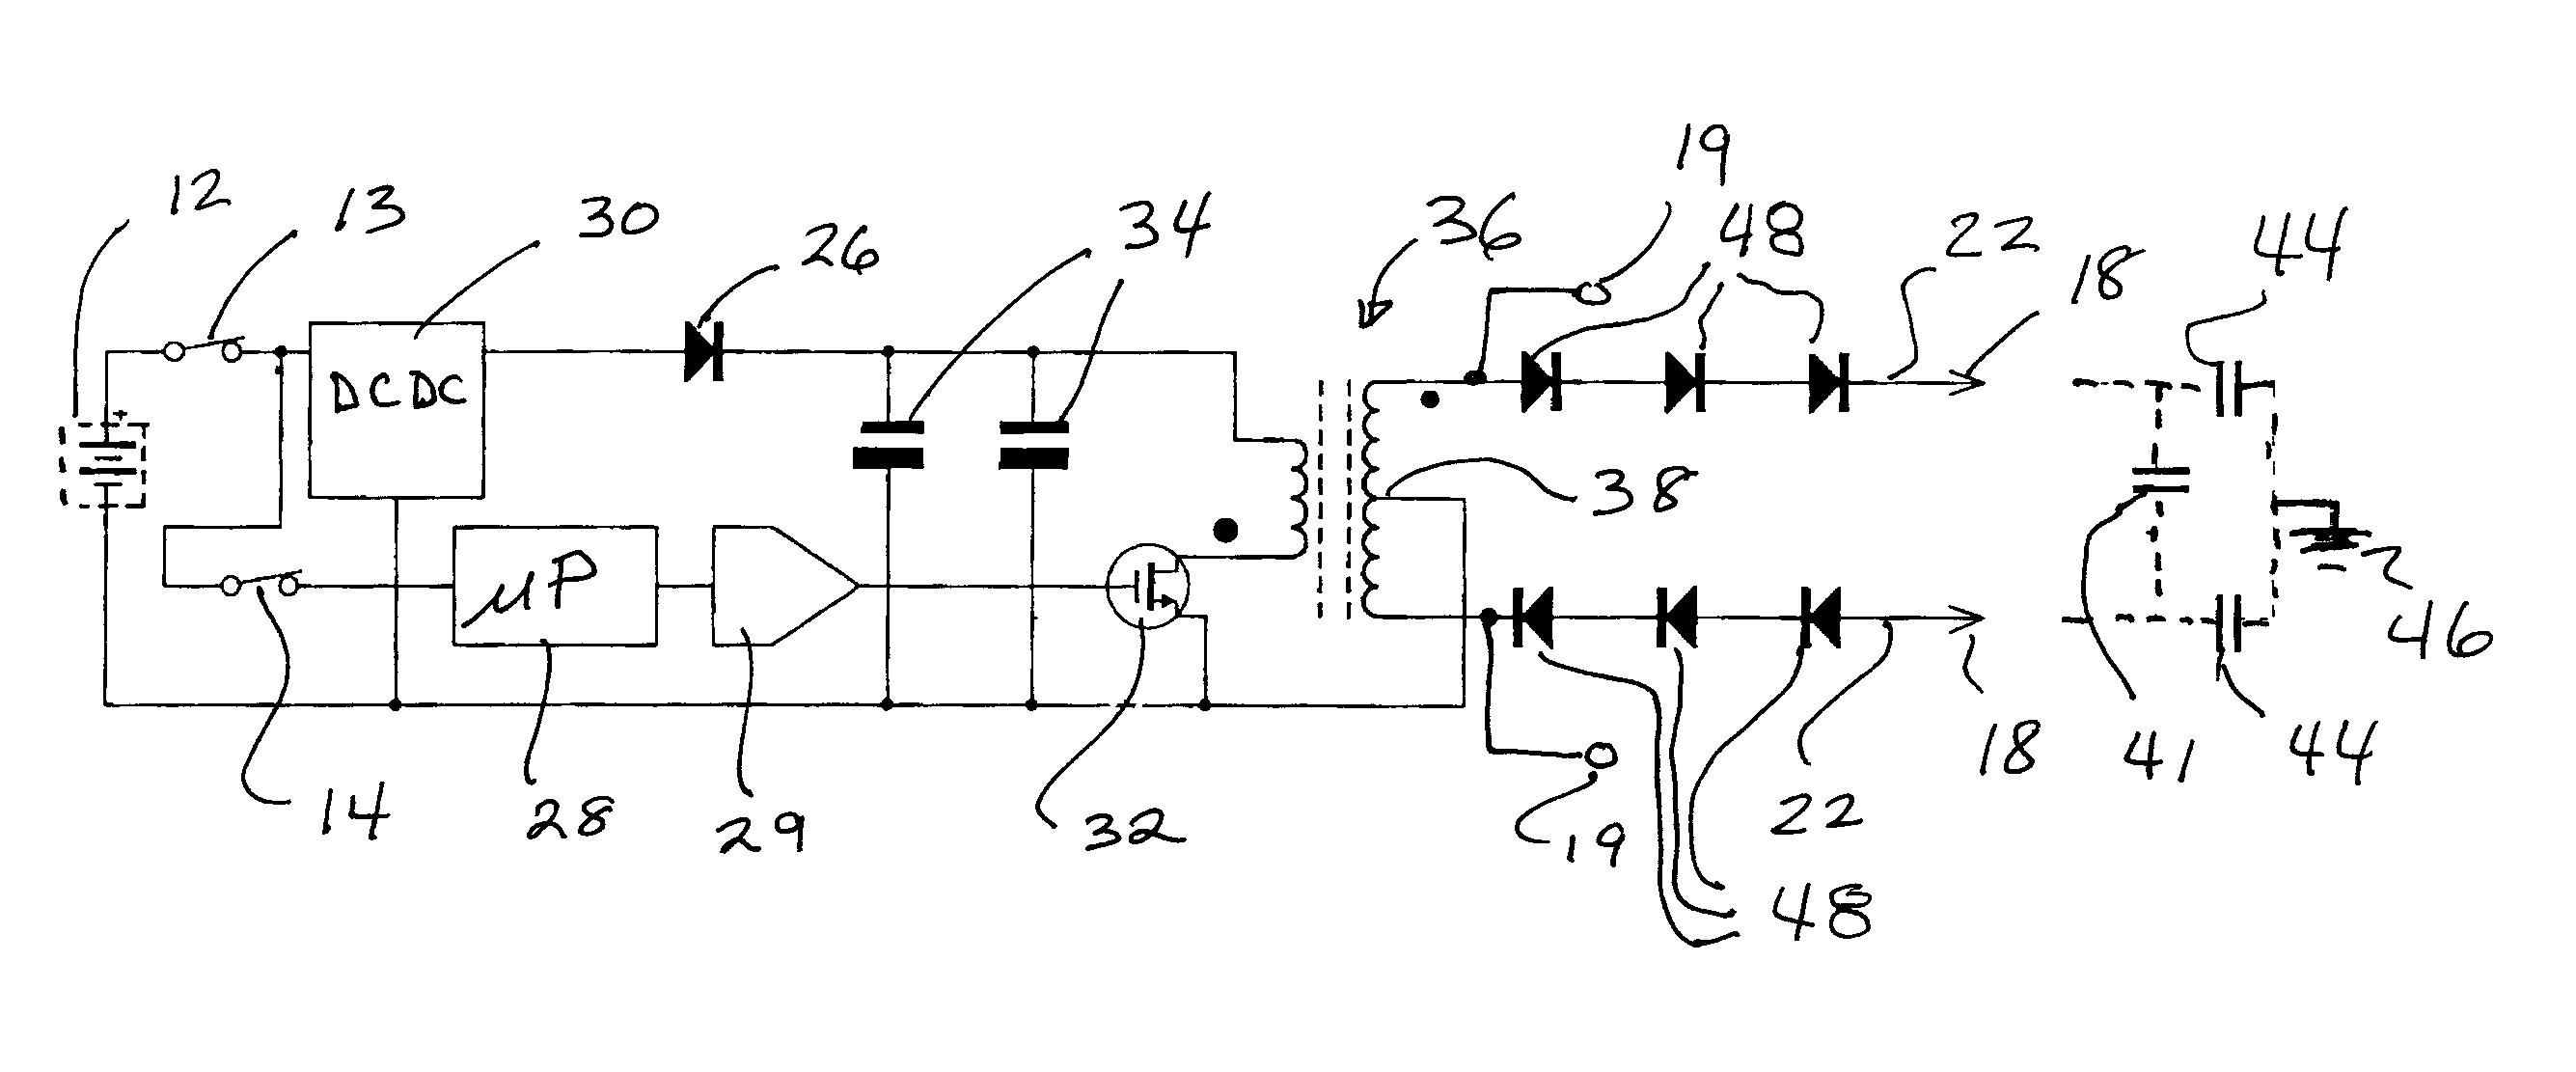 Stun Gun Circuit Auto Electrical Wiring Diagram Taser Electric Fish Shocker Schematic Patent Us7778005